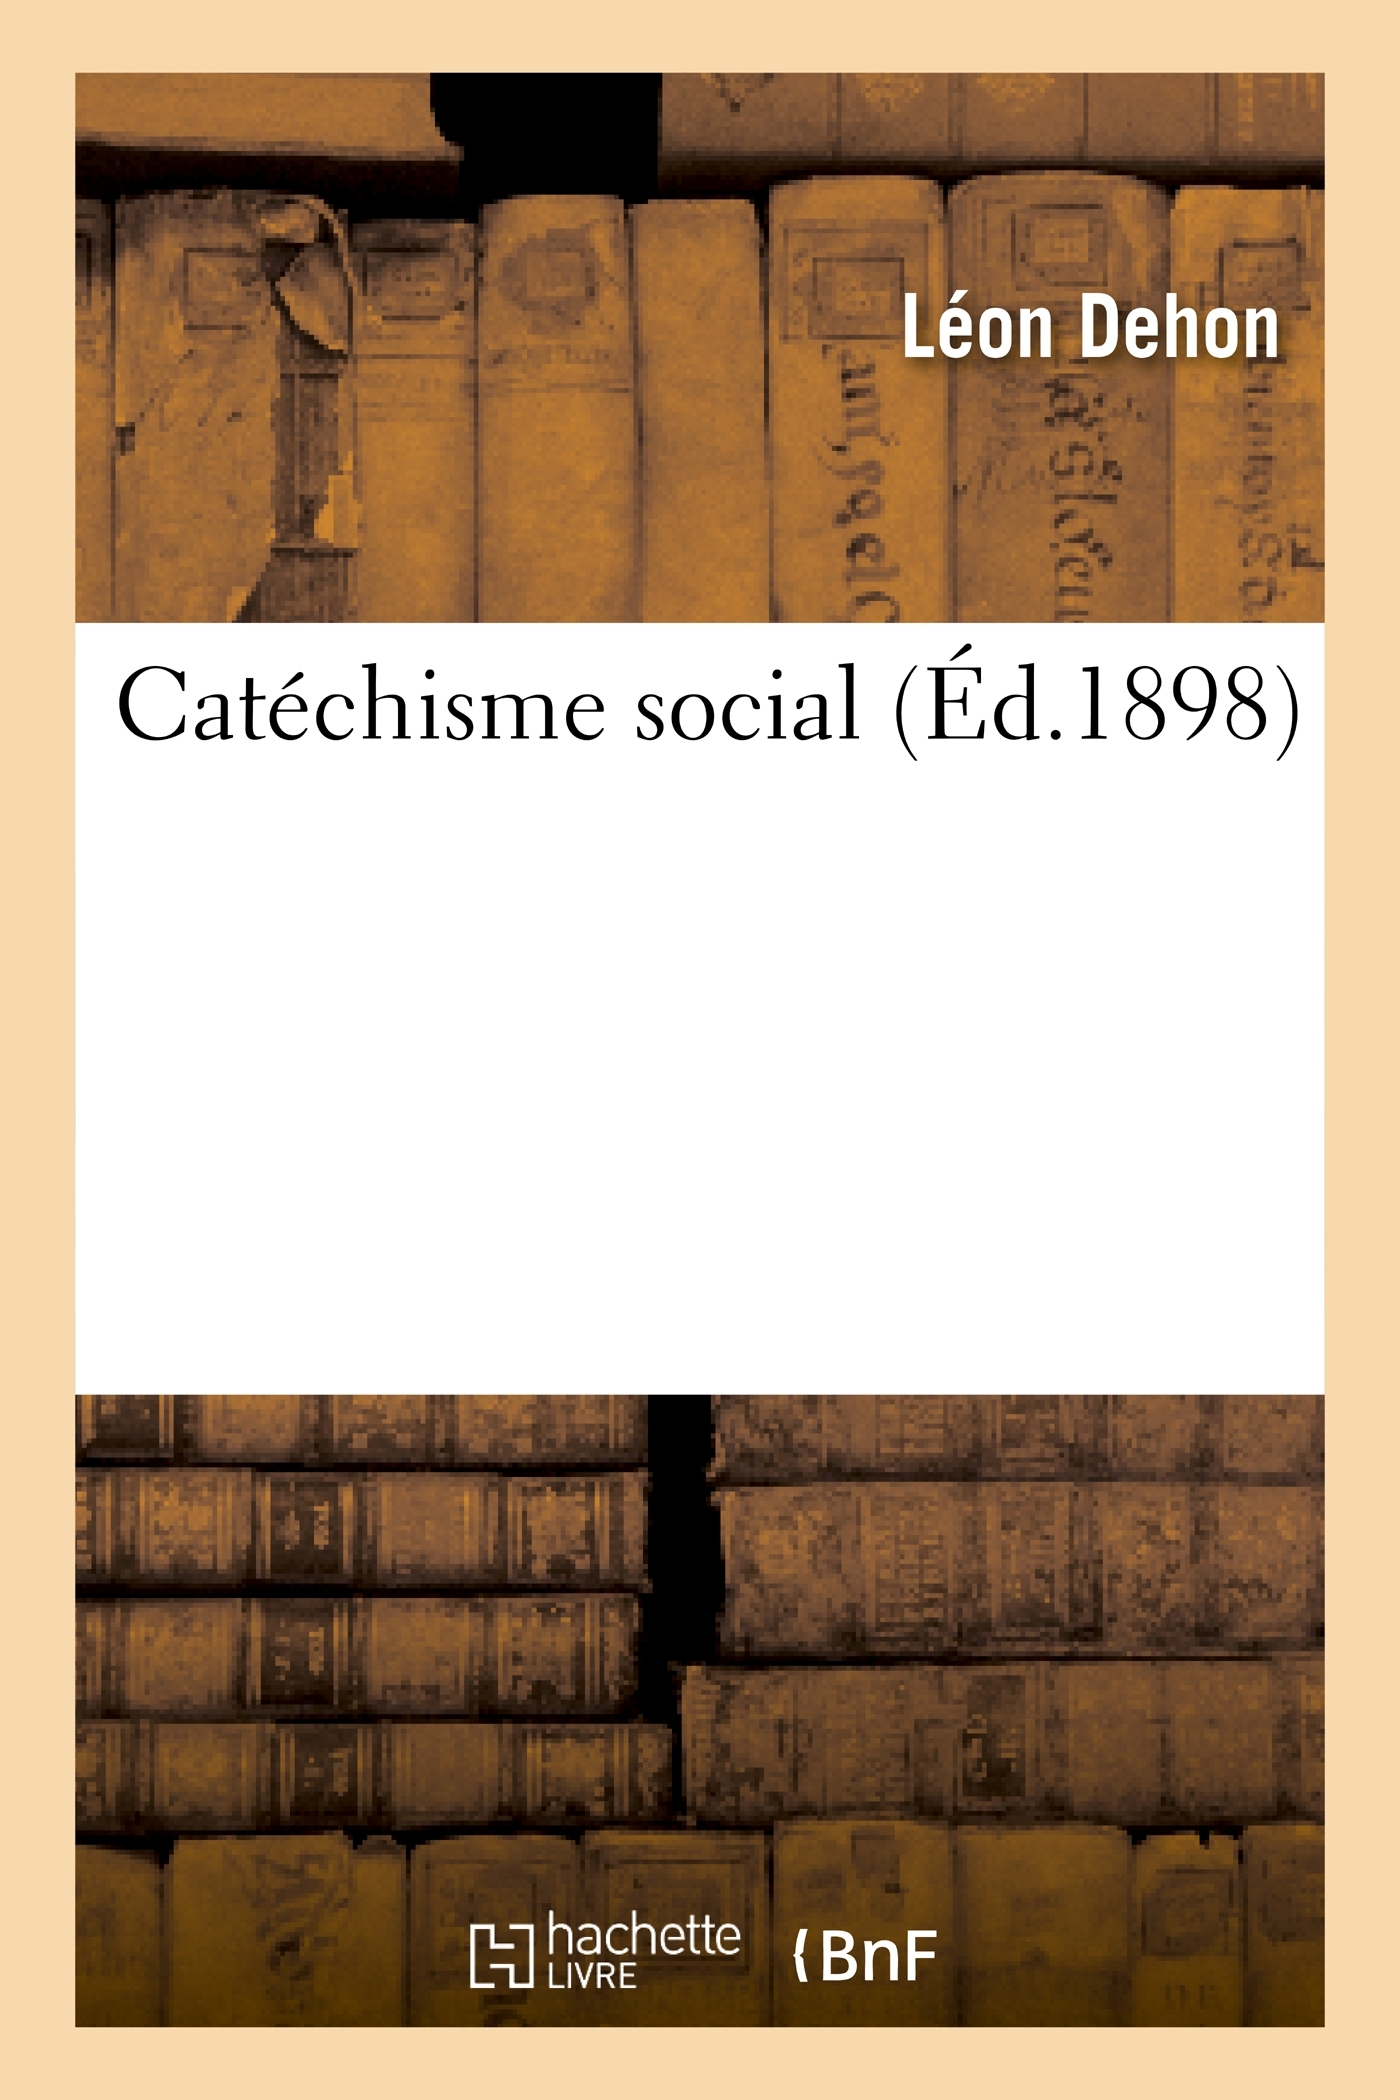 CATECHISME SOCIAL